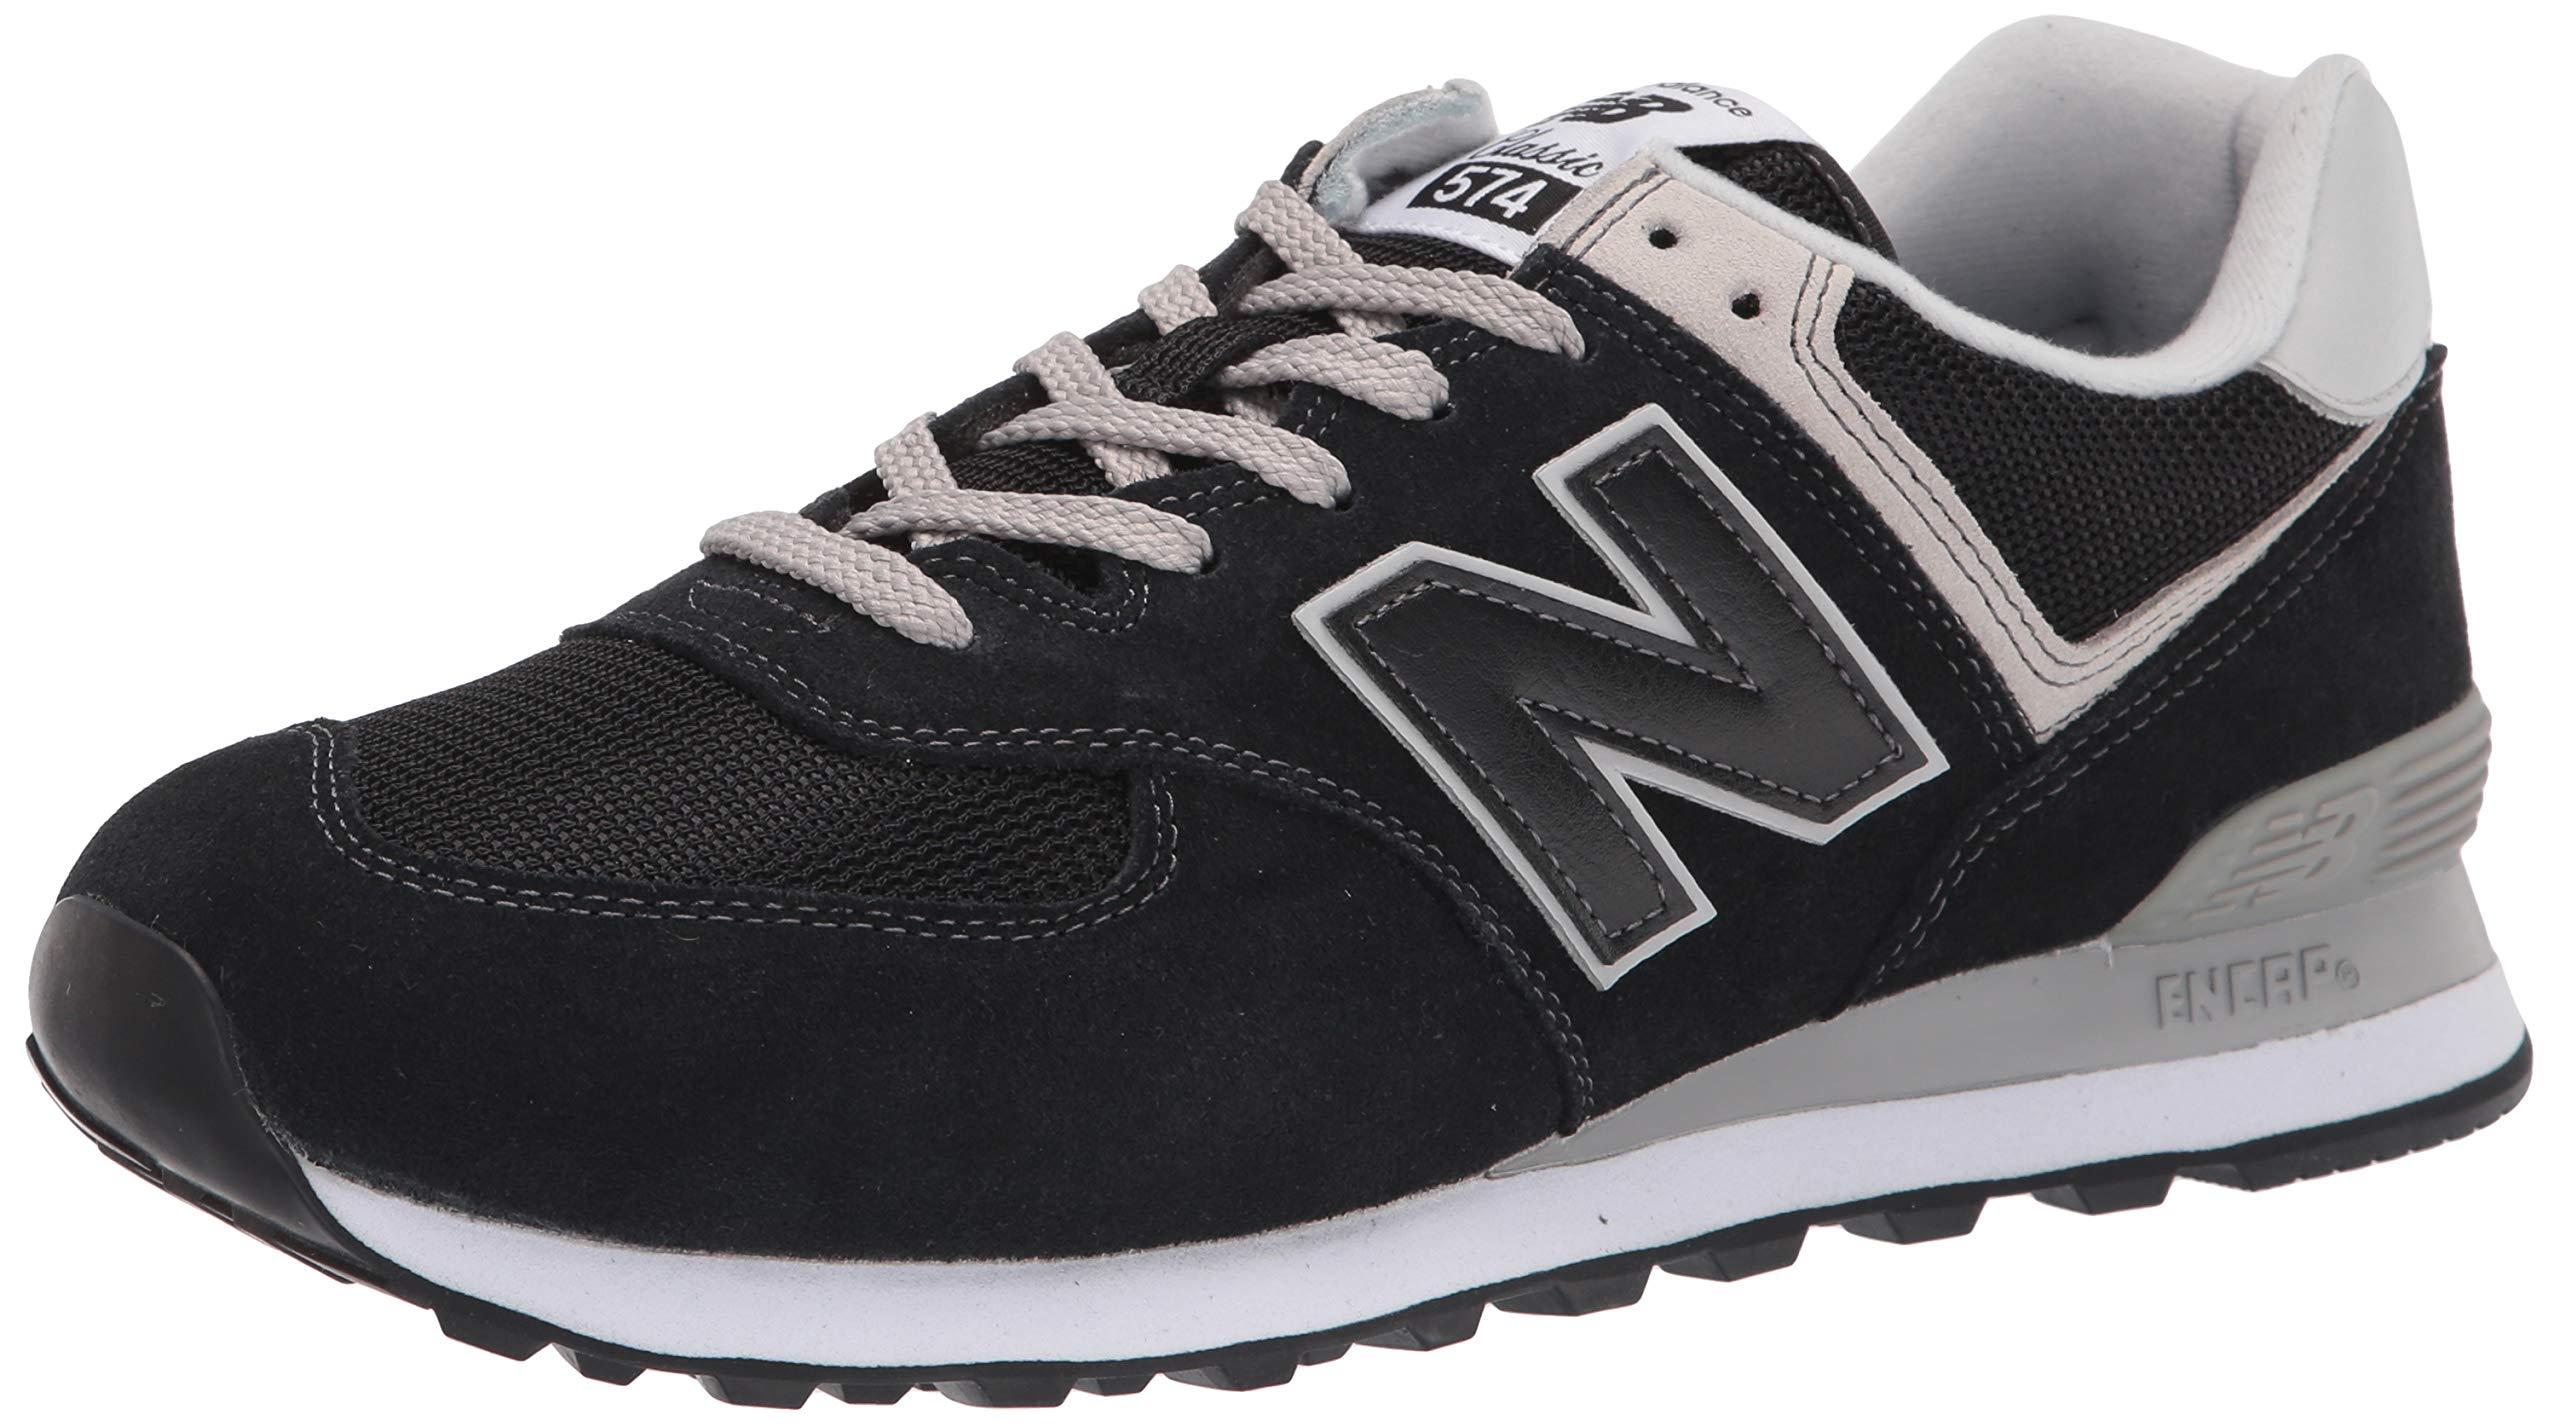 New Balance Rubber Homme 574 V2 Sneaker in Grey (Black) for ...